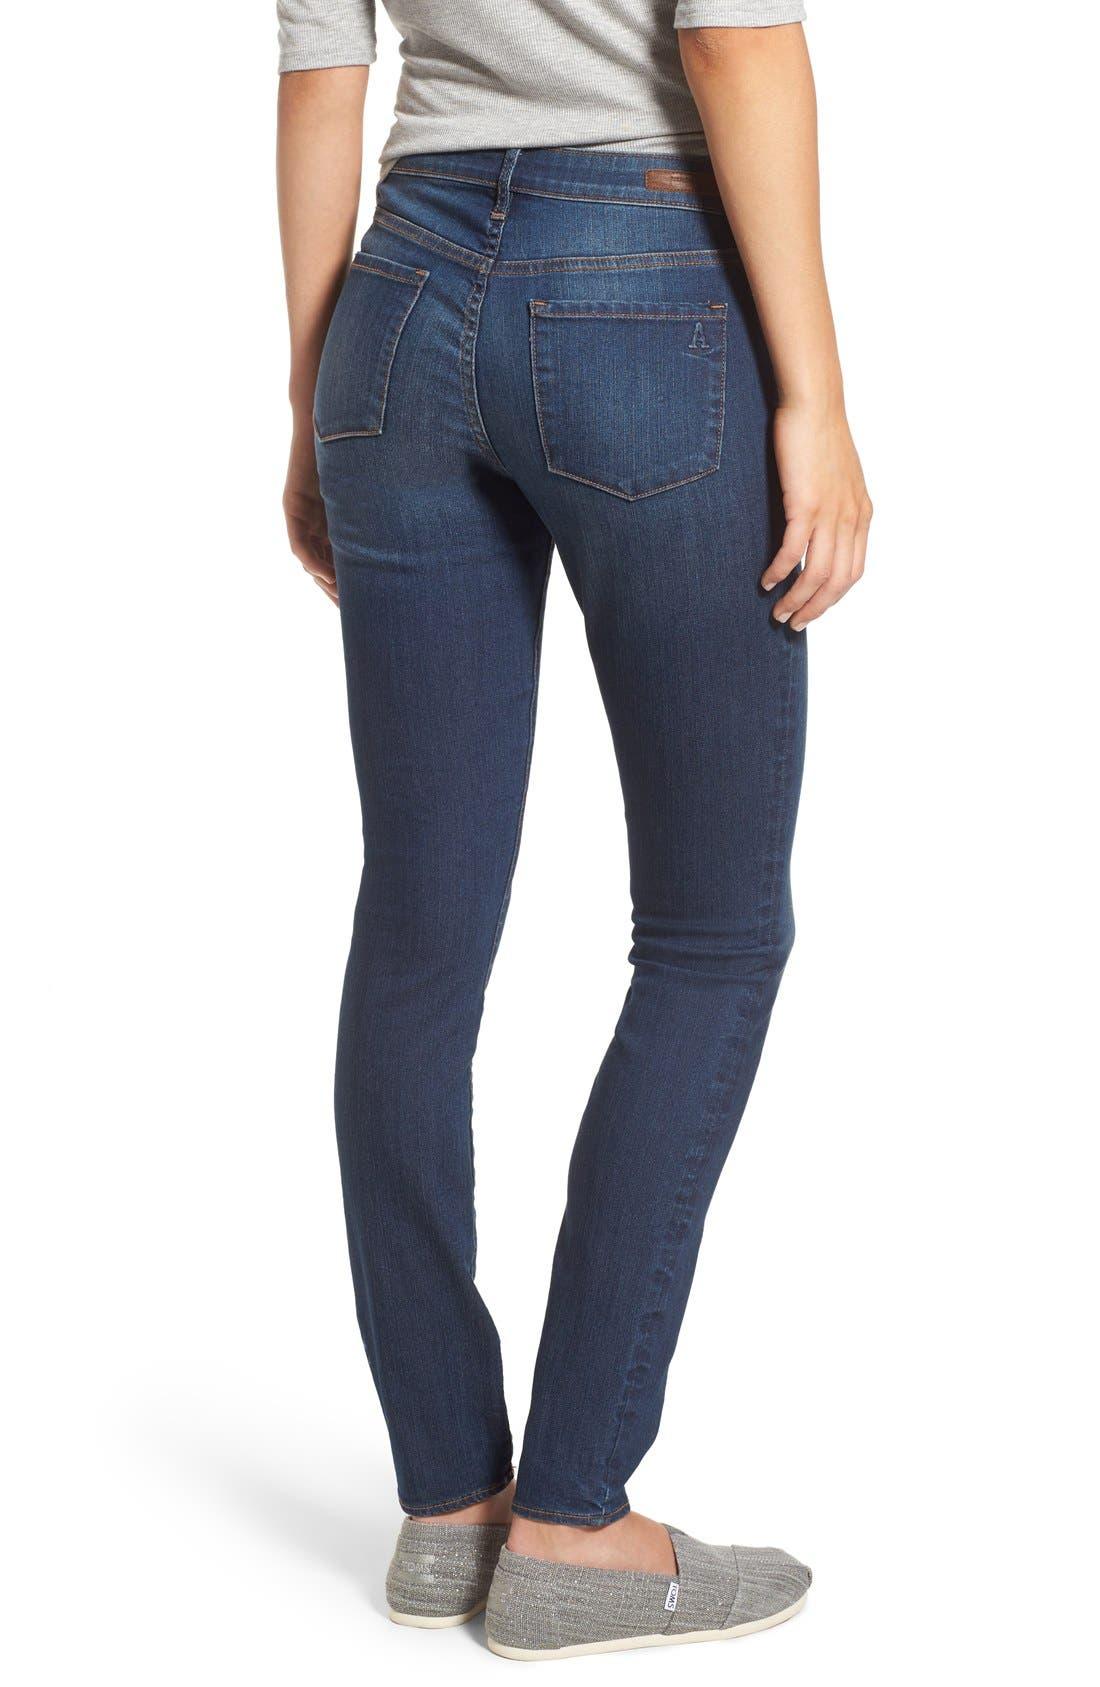 Alternate Image 3  - Articles of Society 'Mya' Skinny Jeans (Americana)